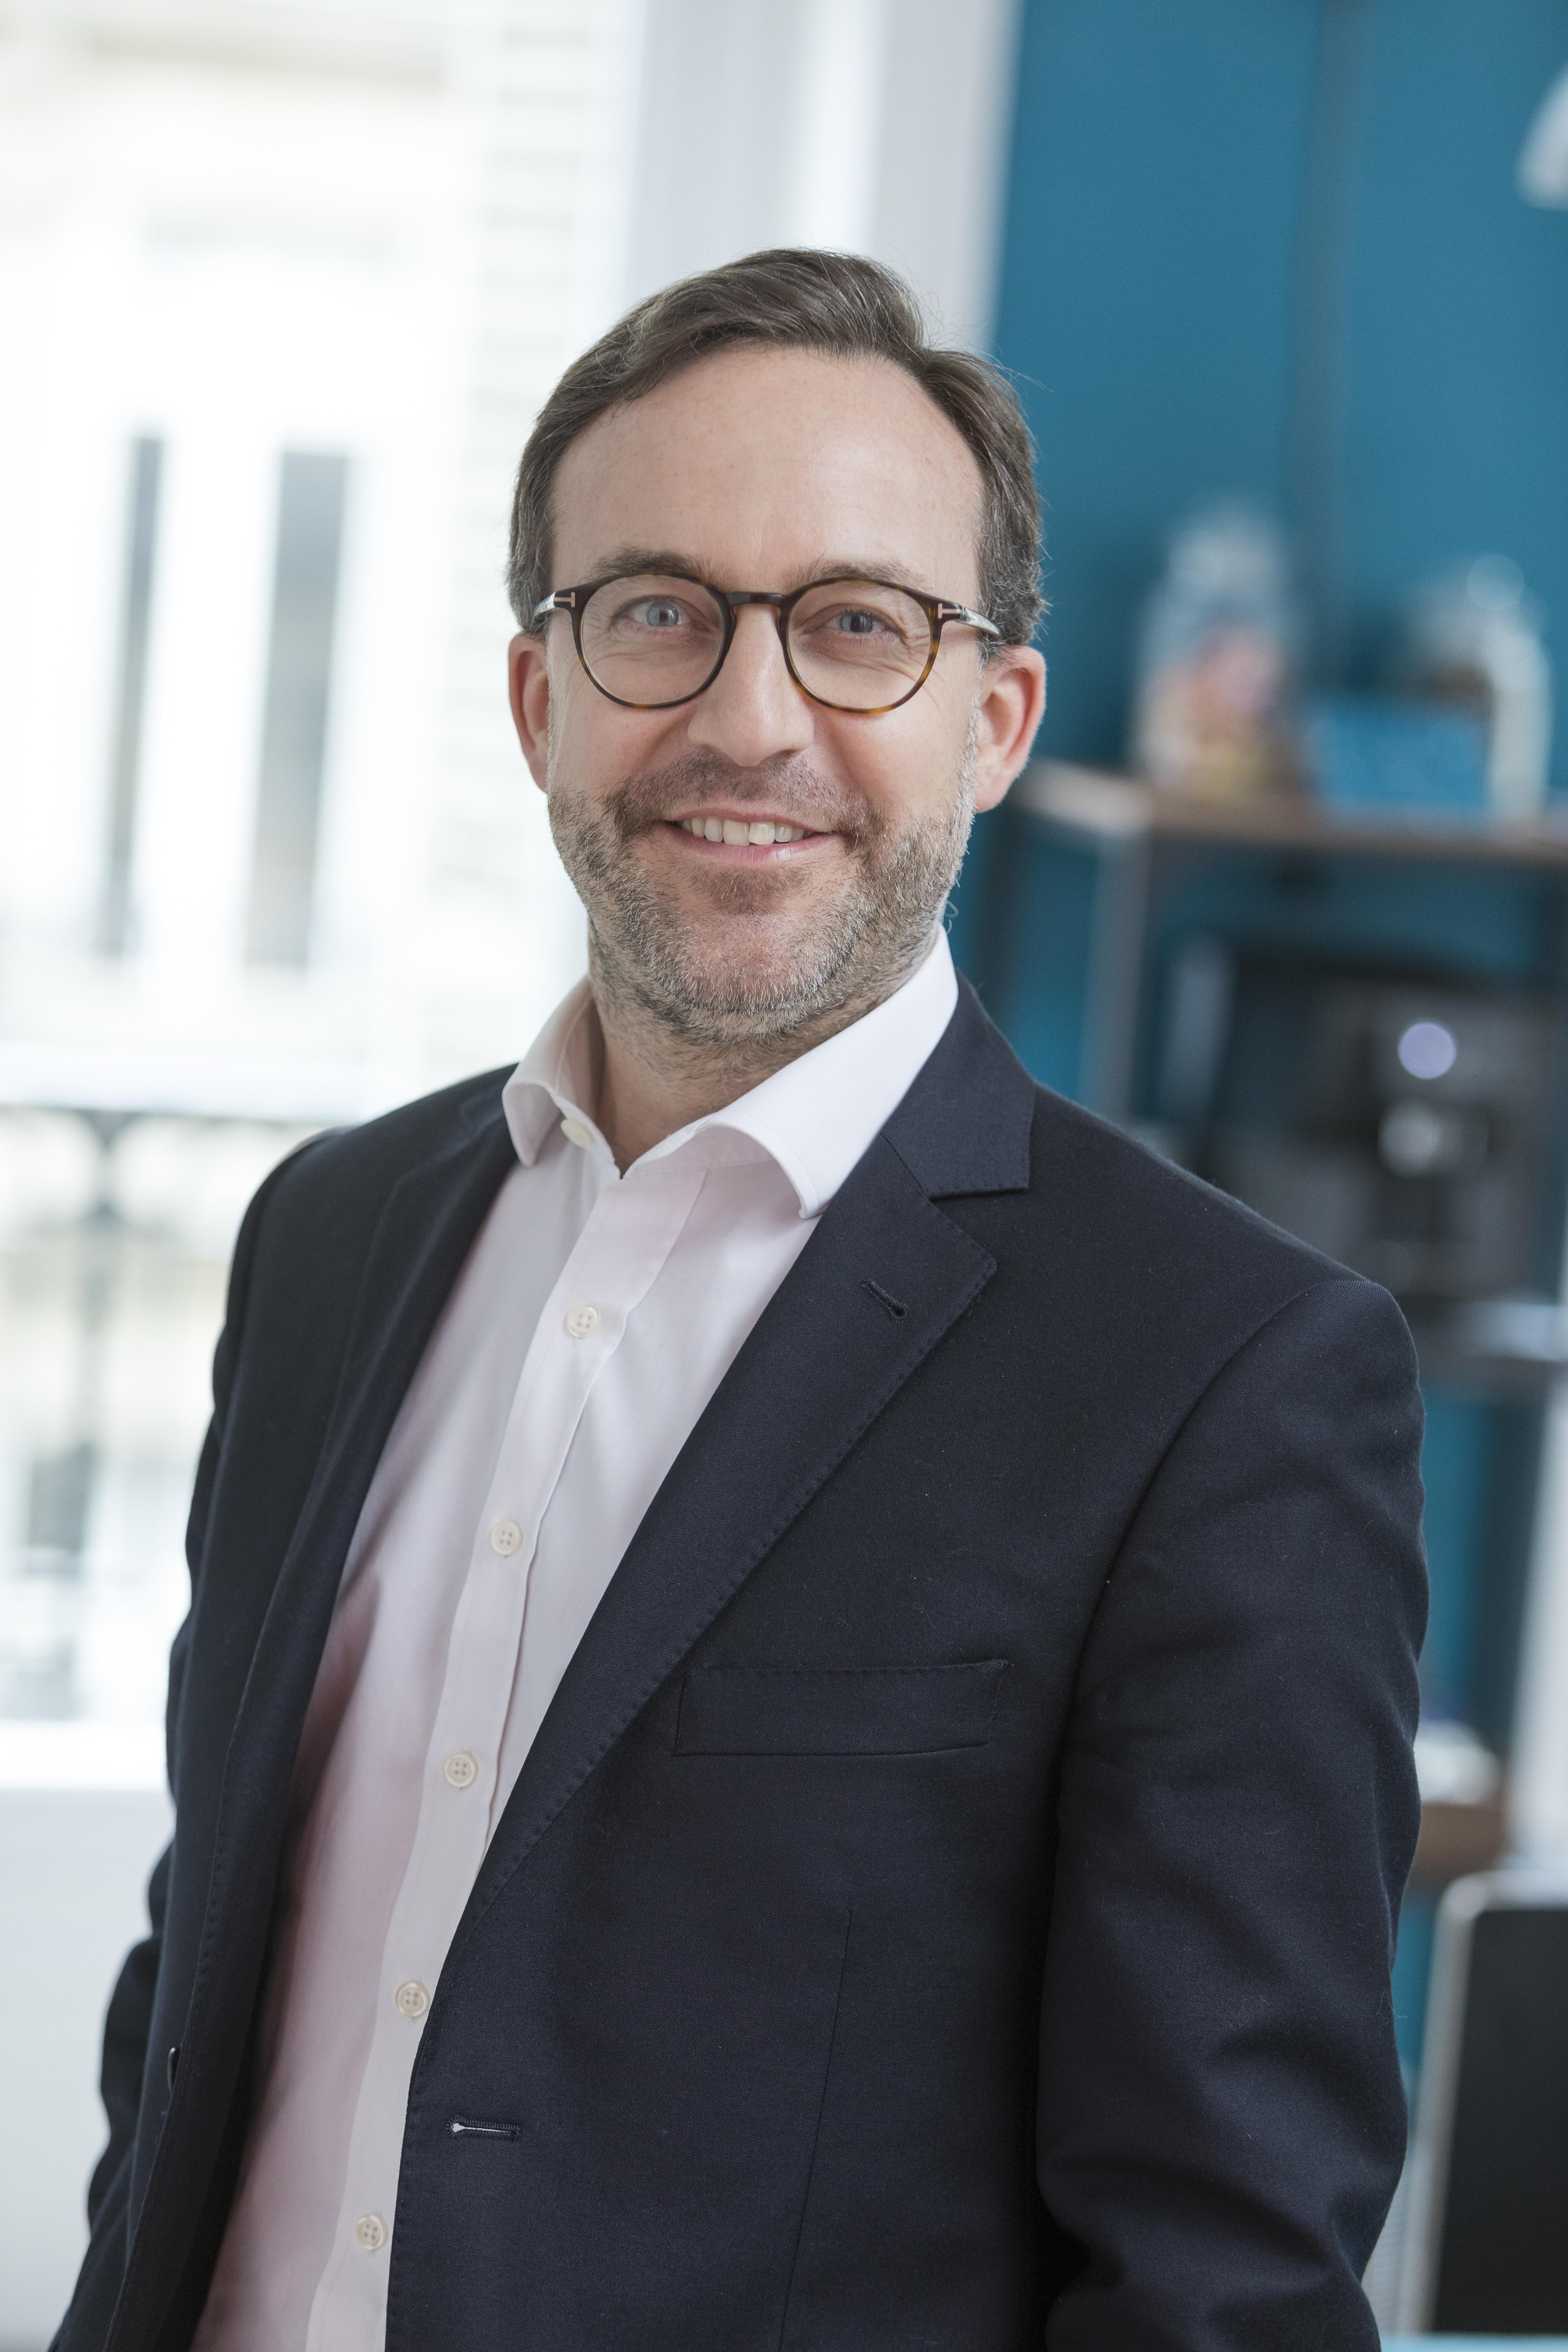 Christophe Arnoux - ESCE P2000 - President ESCE Alumni